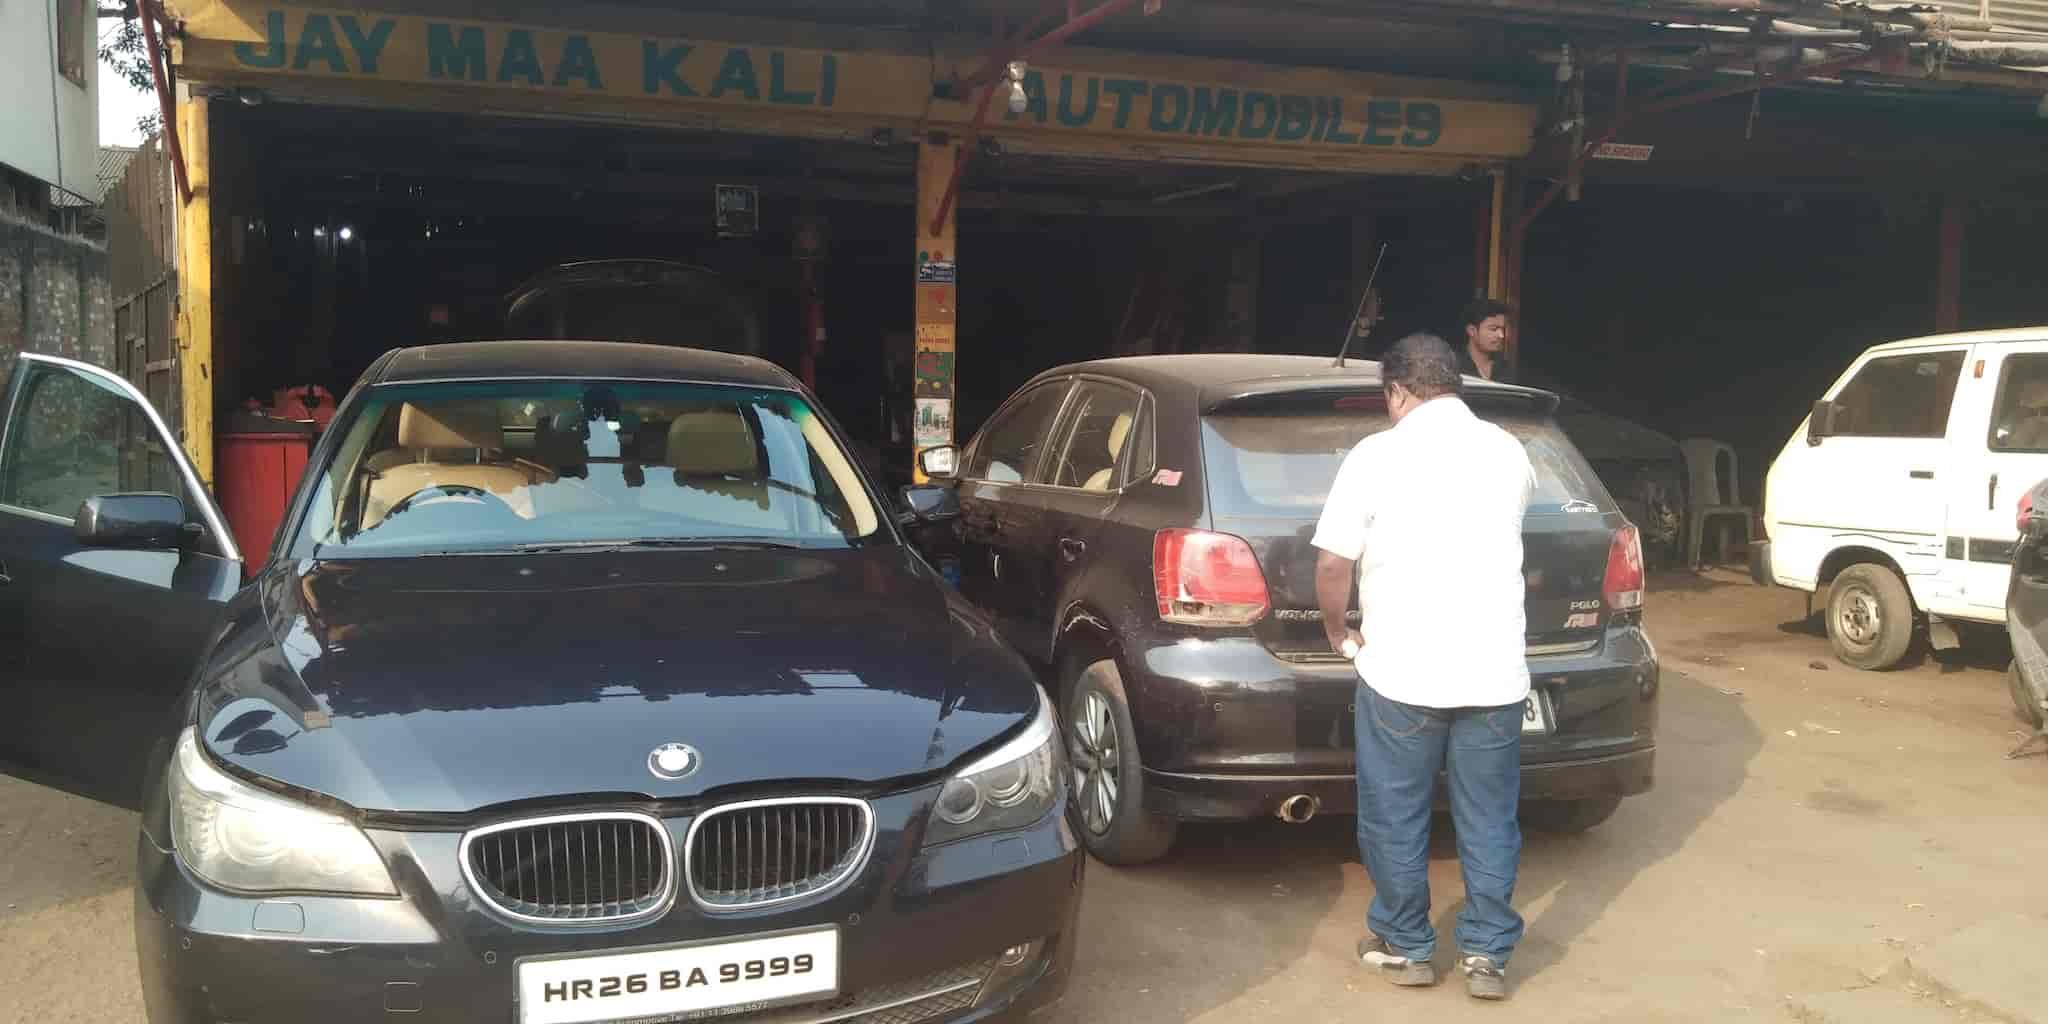 Jay Maa Kali Automobiles Sarabhati Jai Maa Kali Automobiles Car